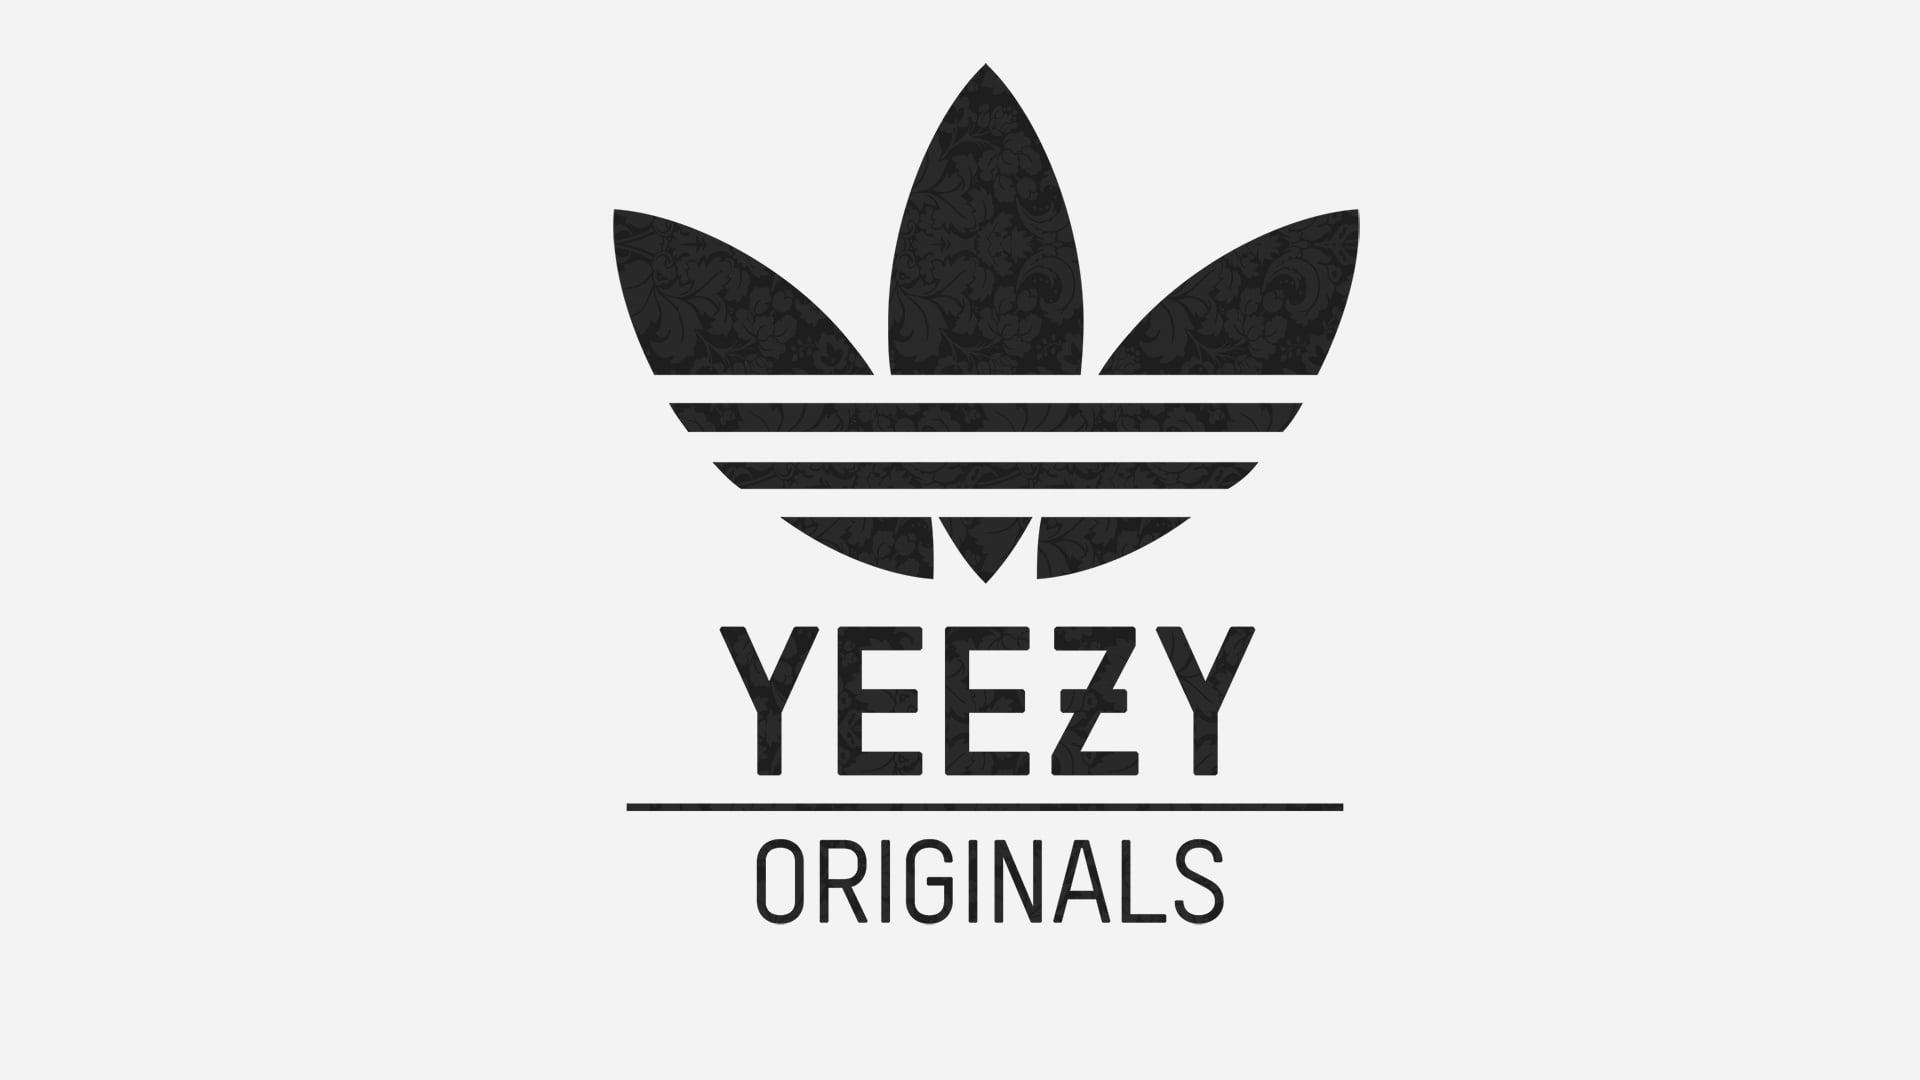 Yeezy X Adidasロゴ アディダスの壁紙 19x1080 Wallpapertip